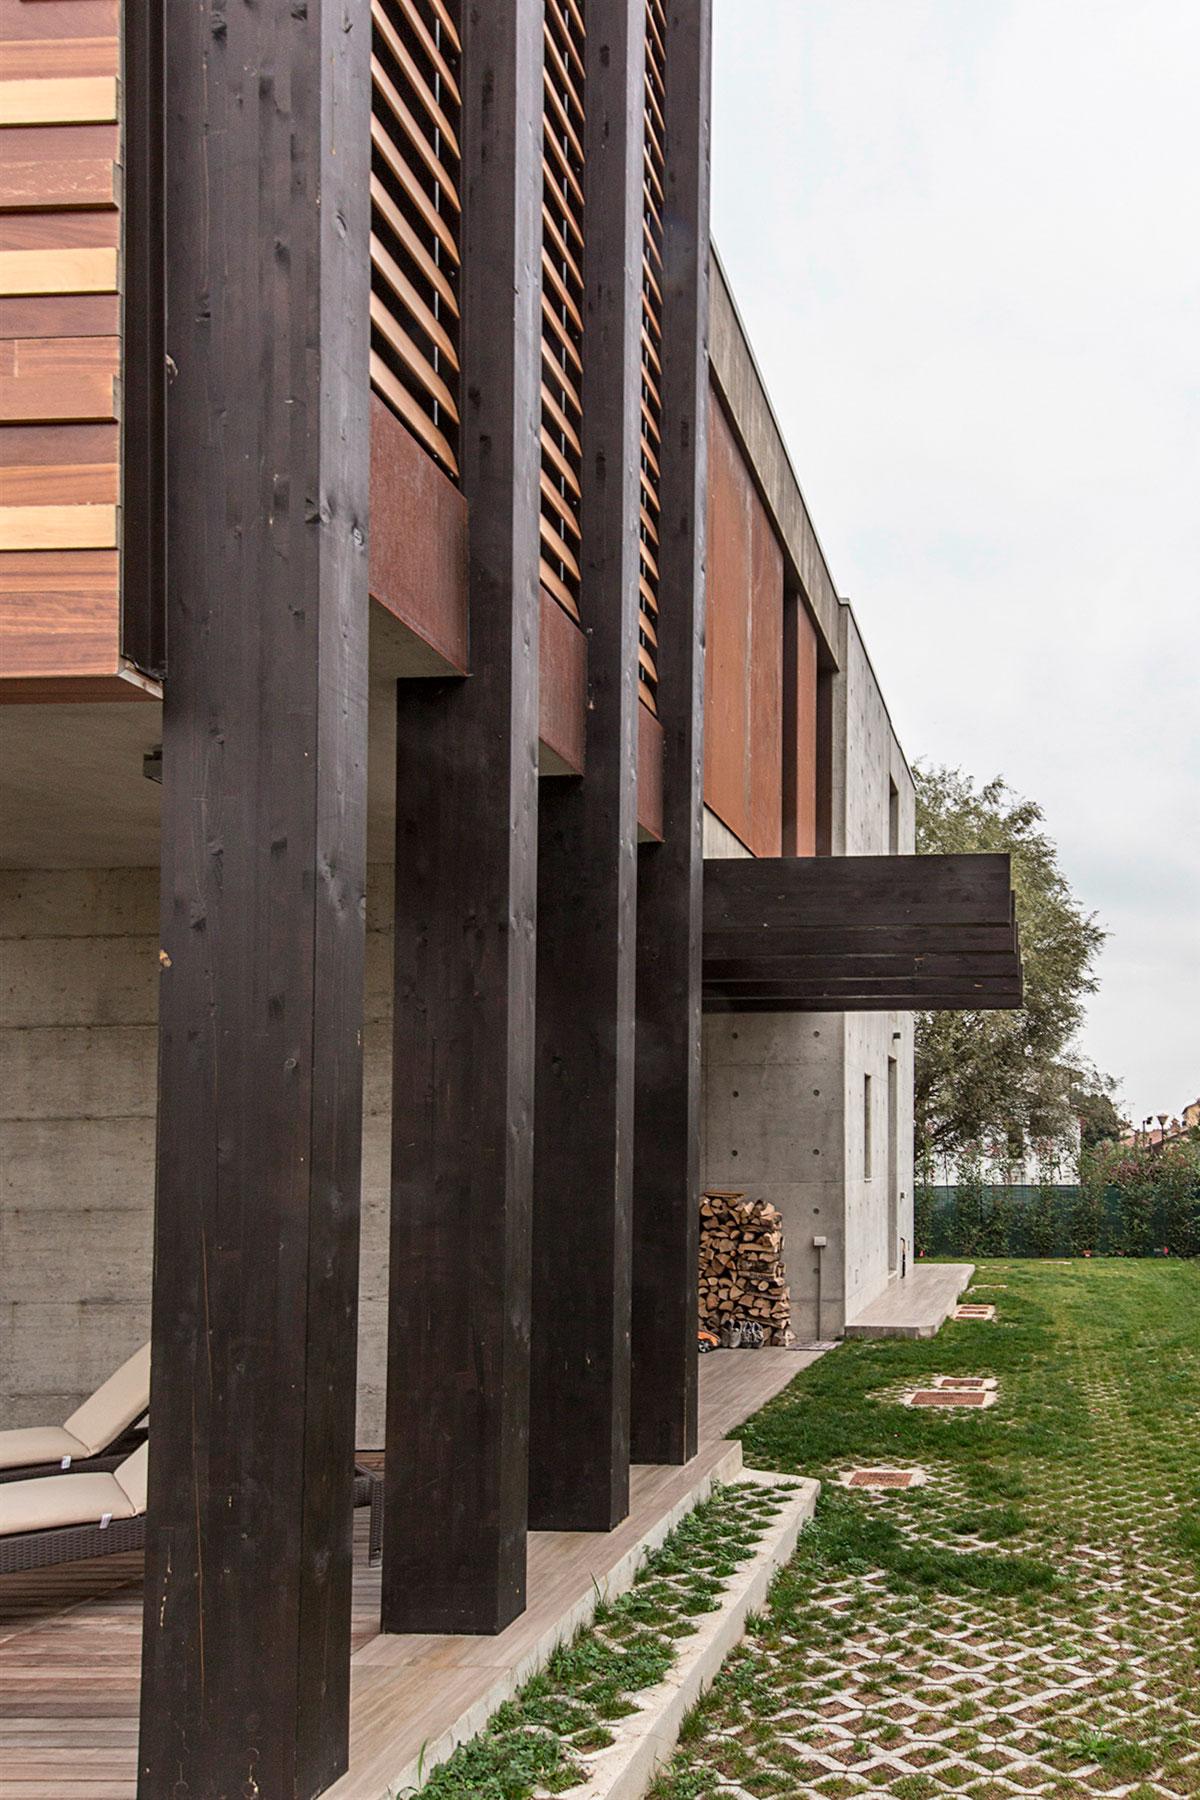 D'Autore Residence near Bologna by Giraldi Associati Architetti-04